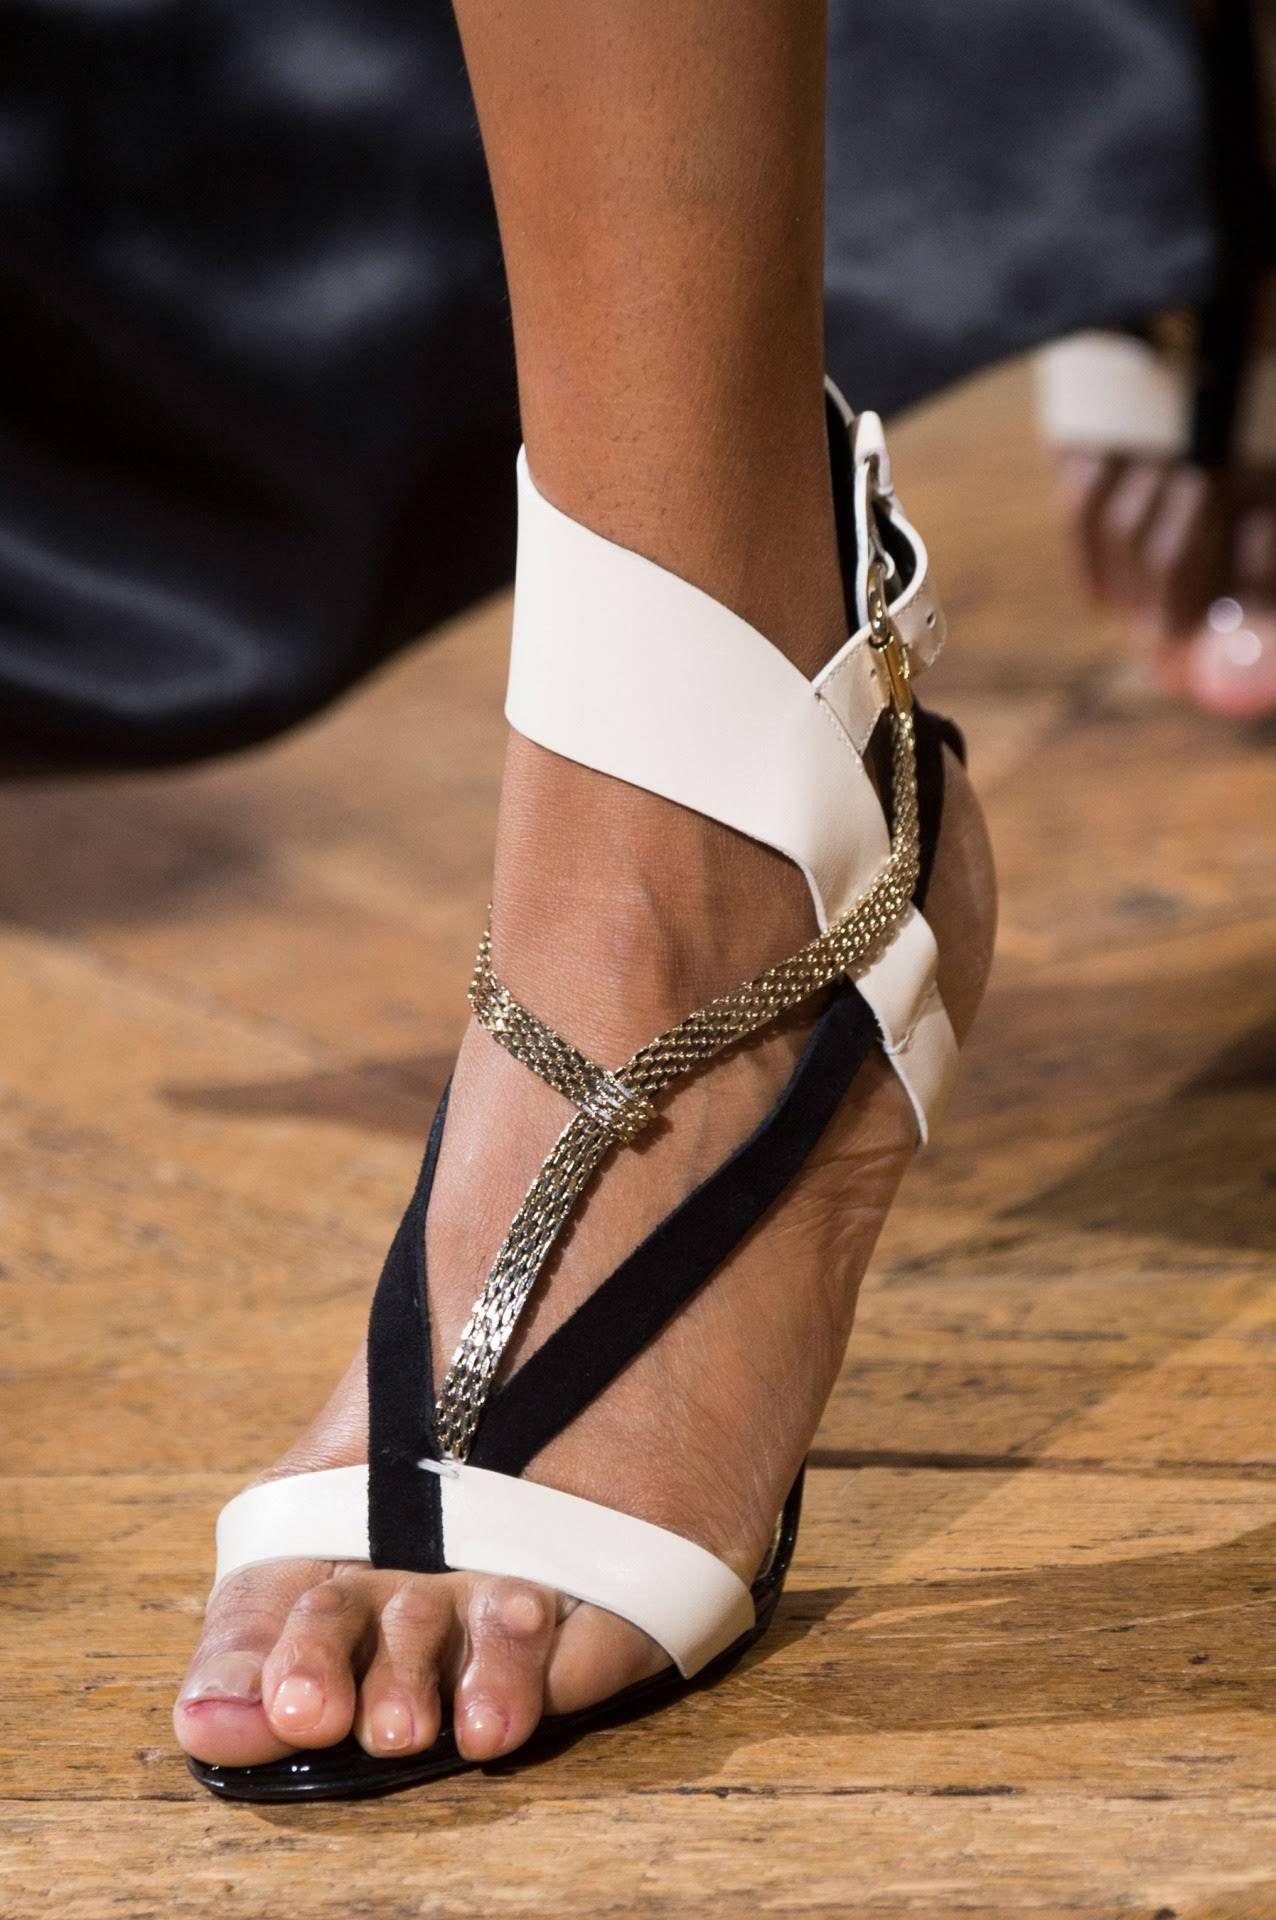 64e7902a5ee Γυναικεία Παπούτσια, Μόδα Στο Παρίσι, Lanvin, Καλά Παπούτσια, Πασαρέλα,  Τάσεις,